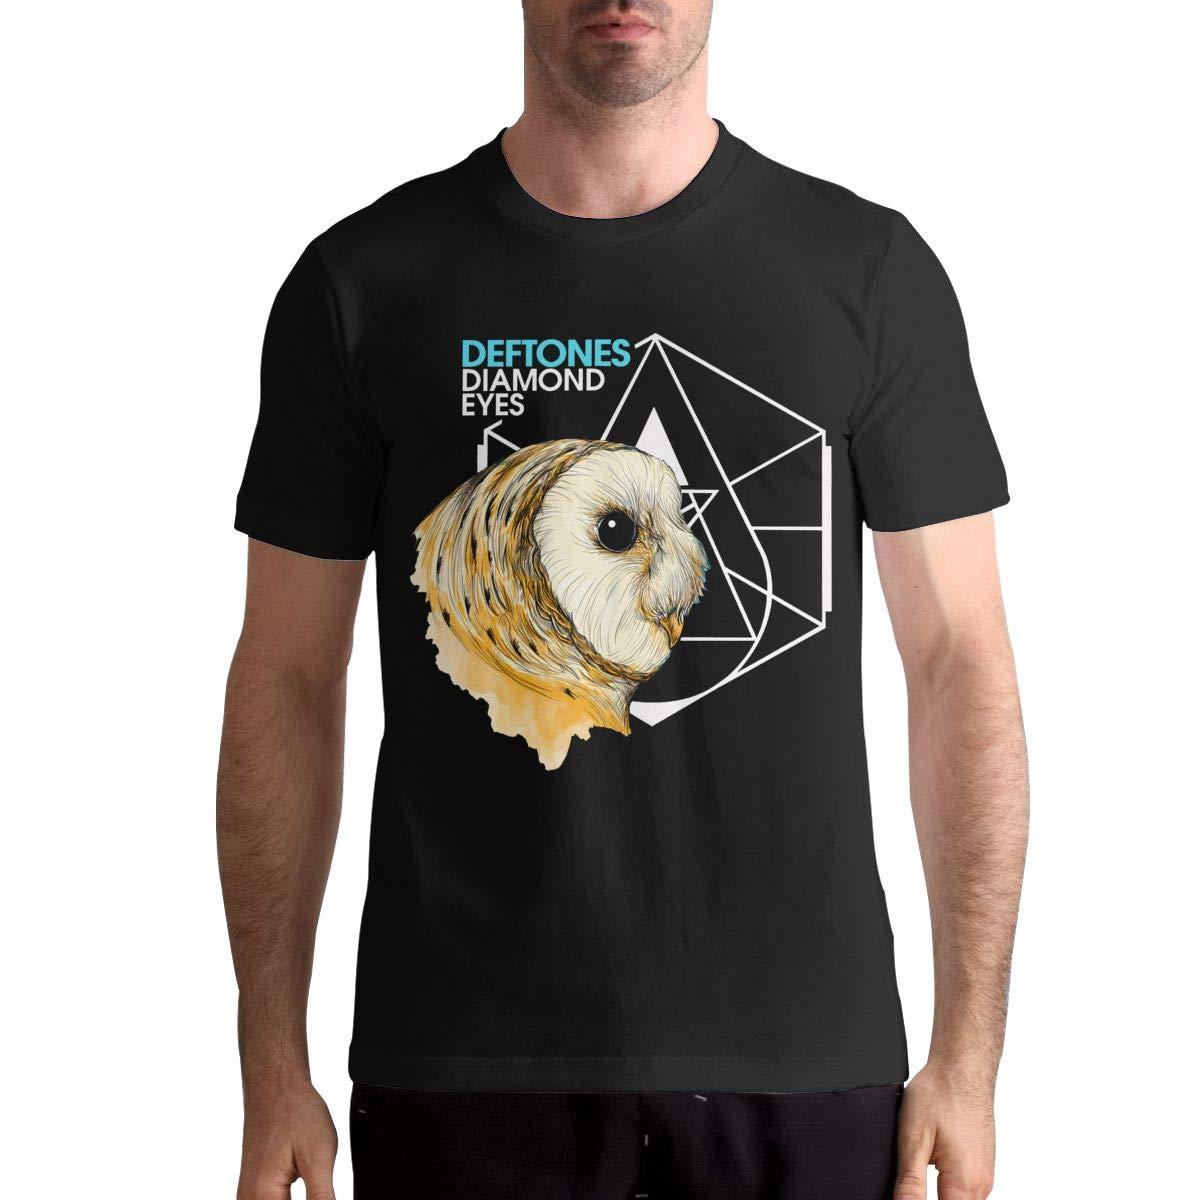 Deftones T Shirt Casual Personality Fashion Short Sleeved Shirt